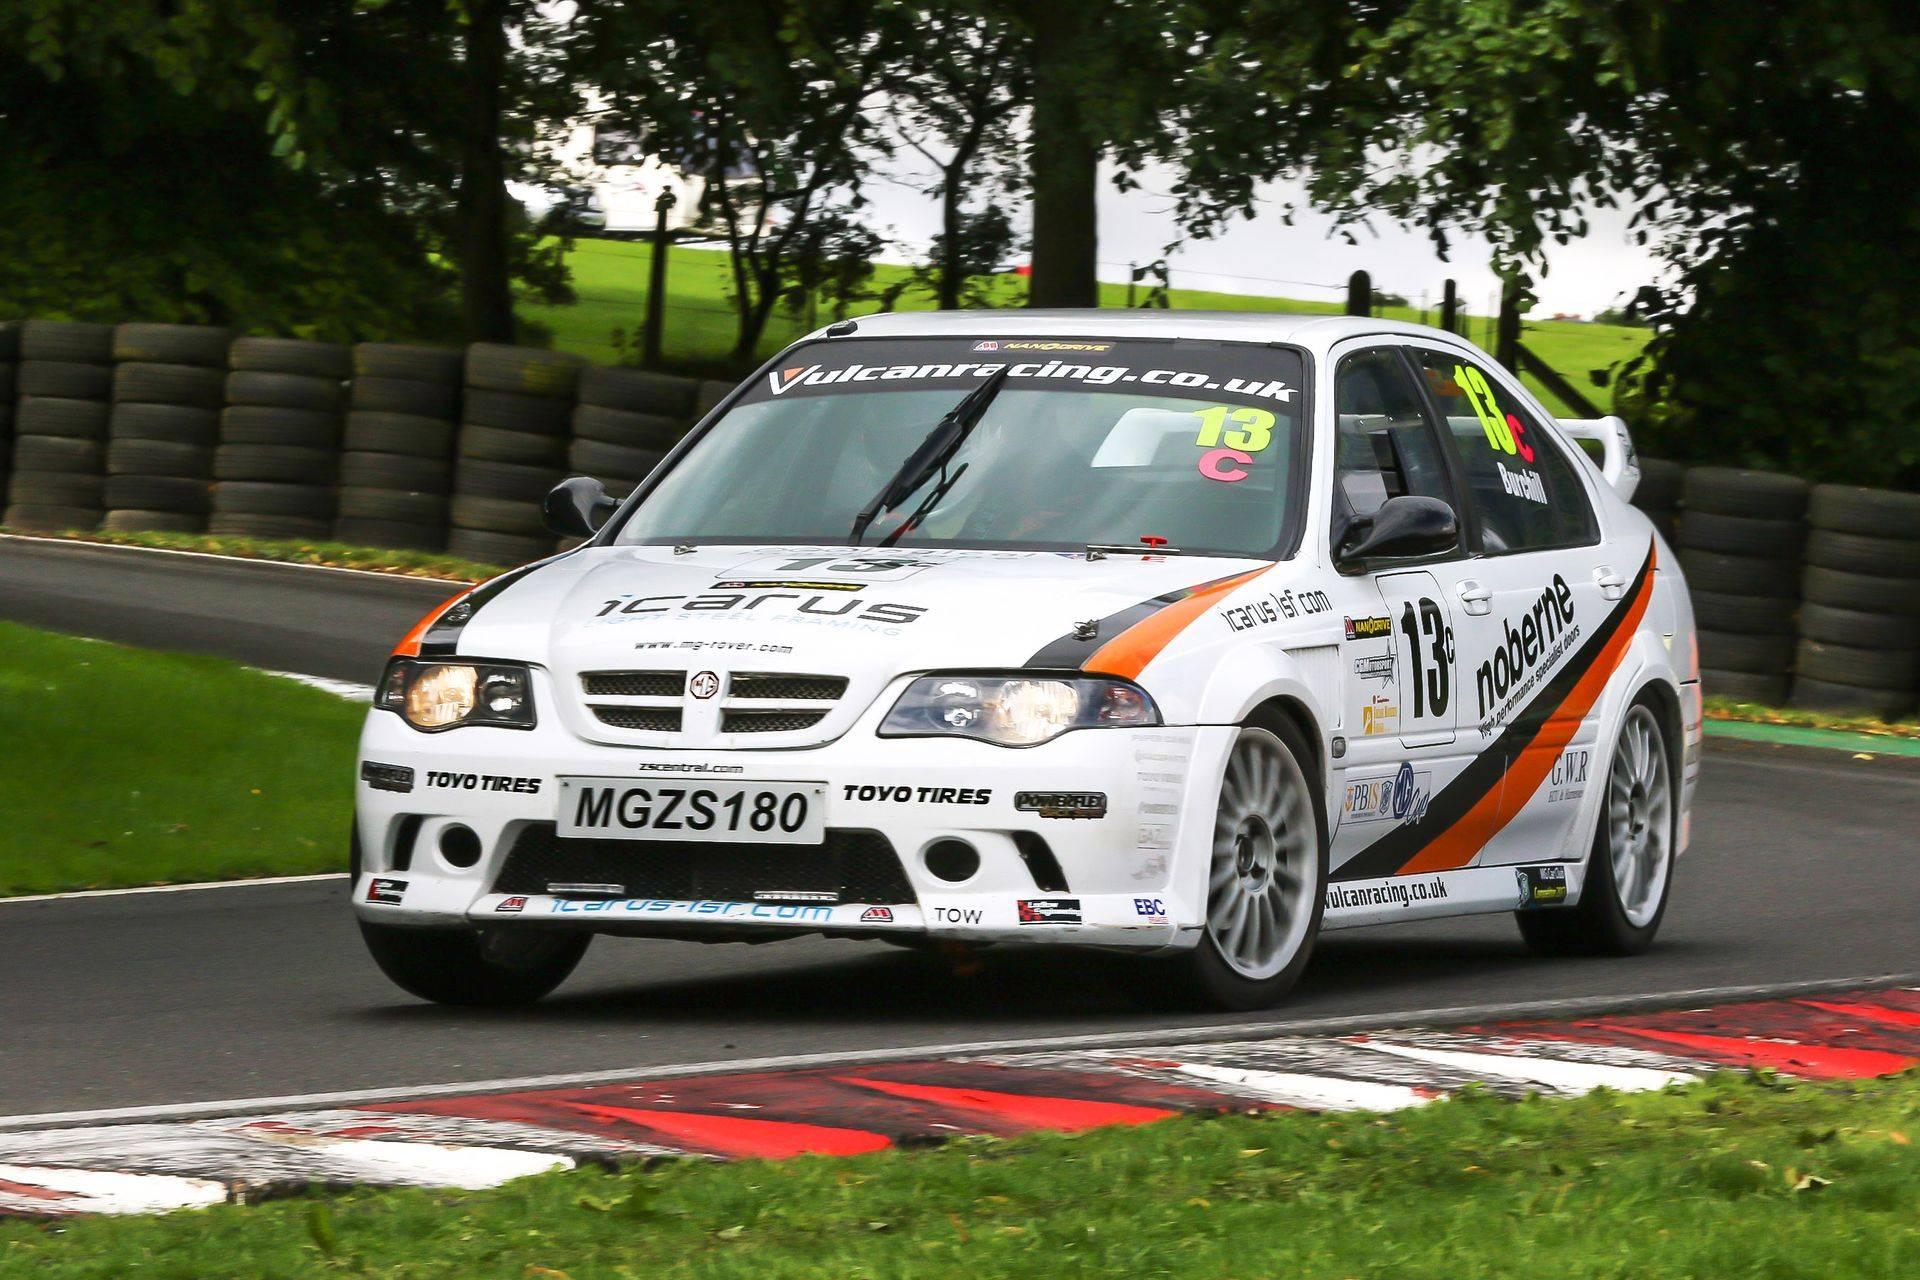 Cadwell Park Vulcan Racing MGZS